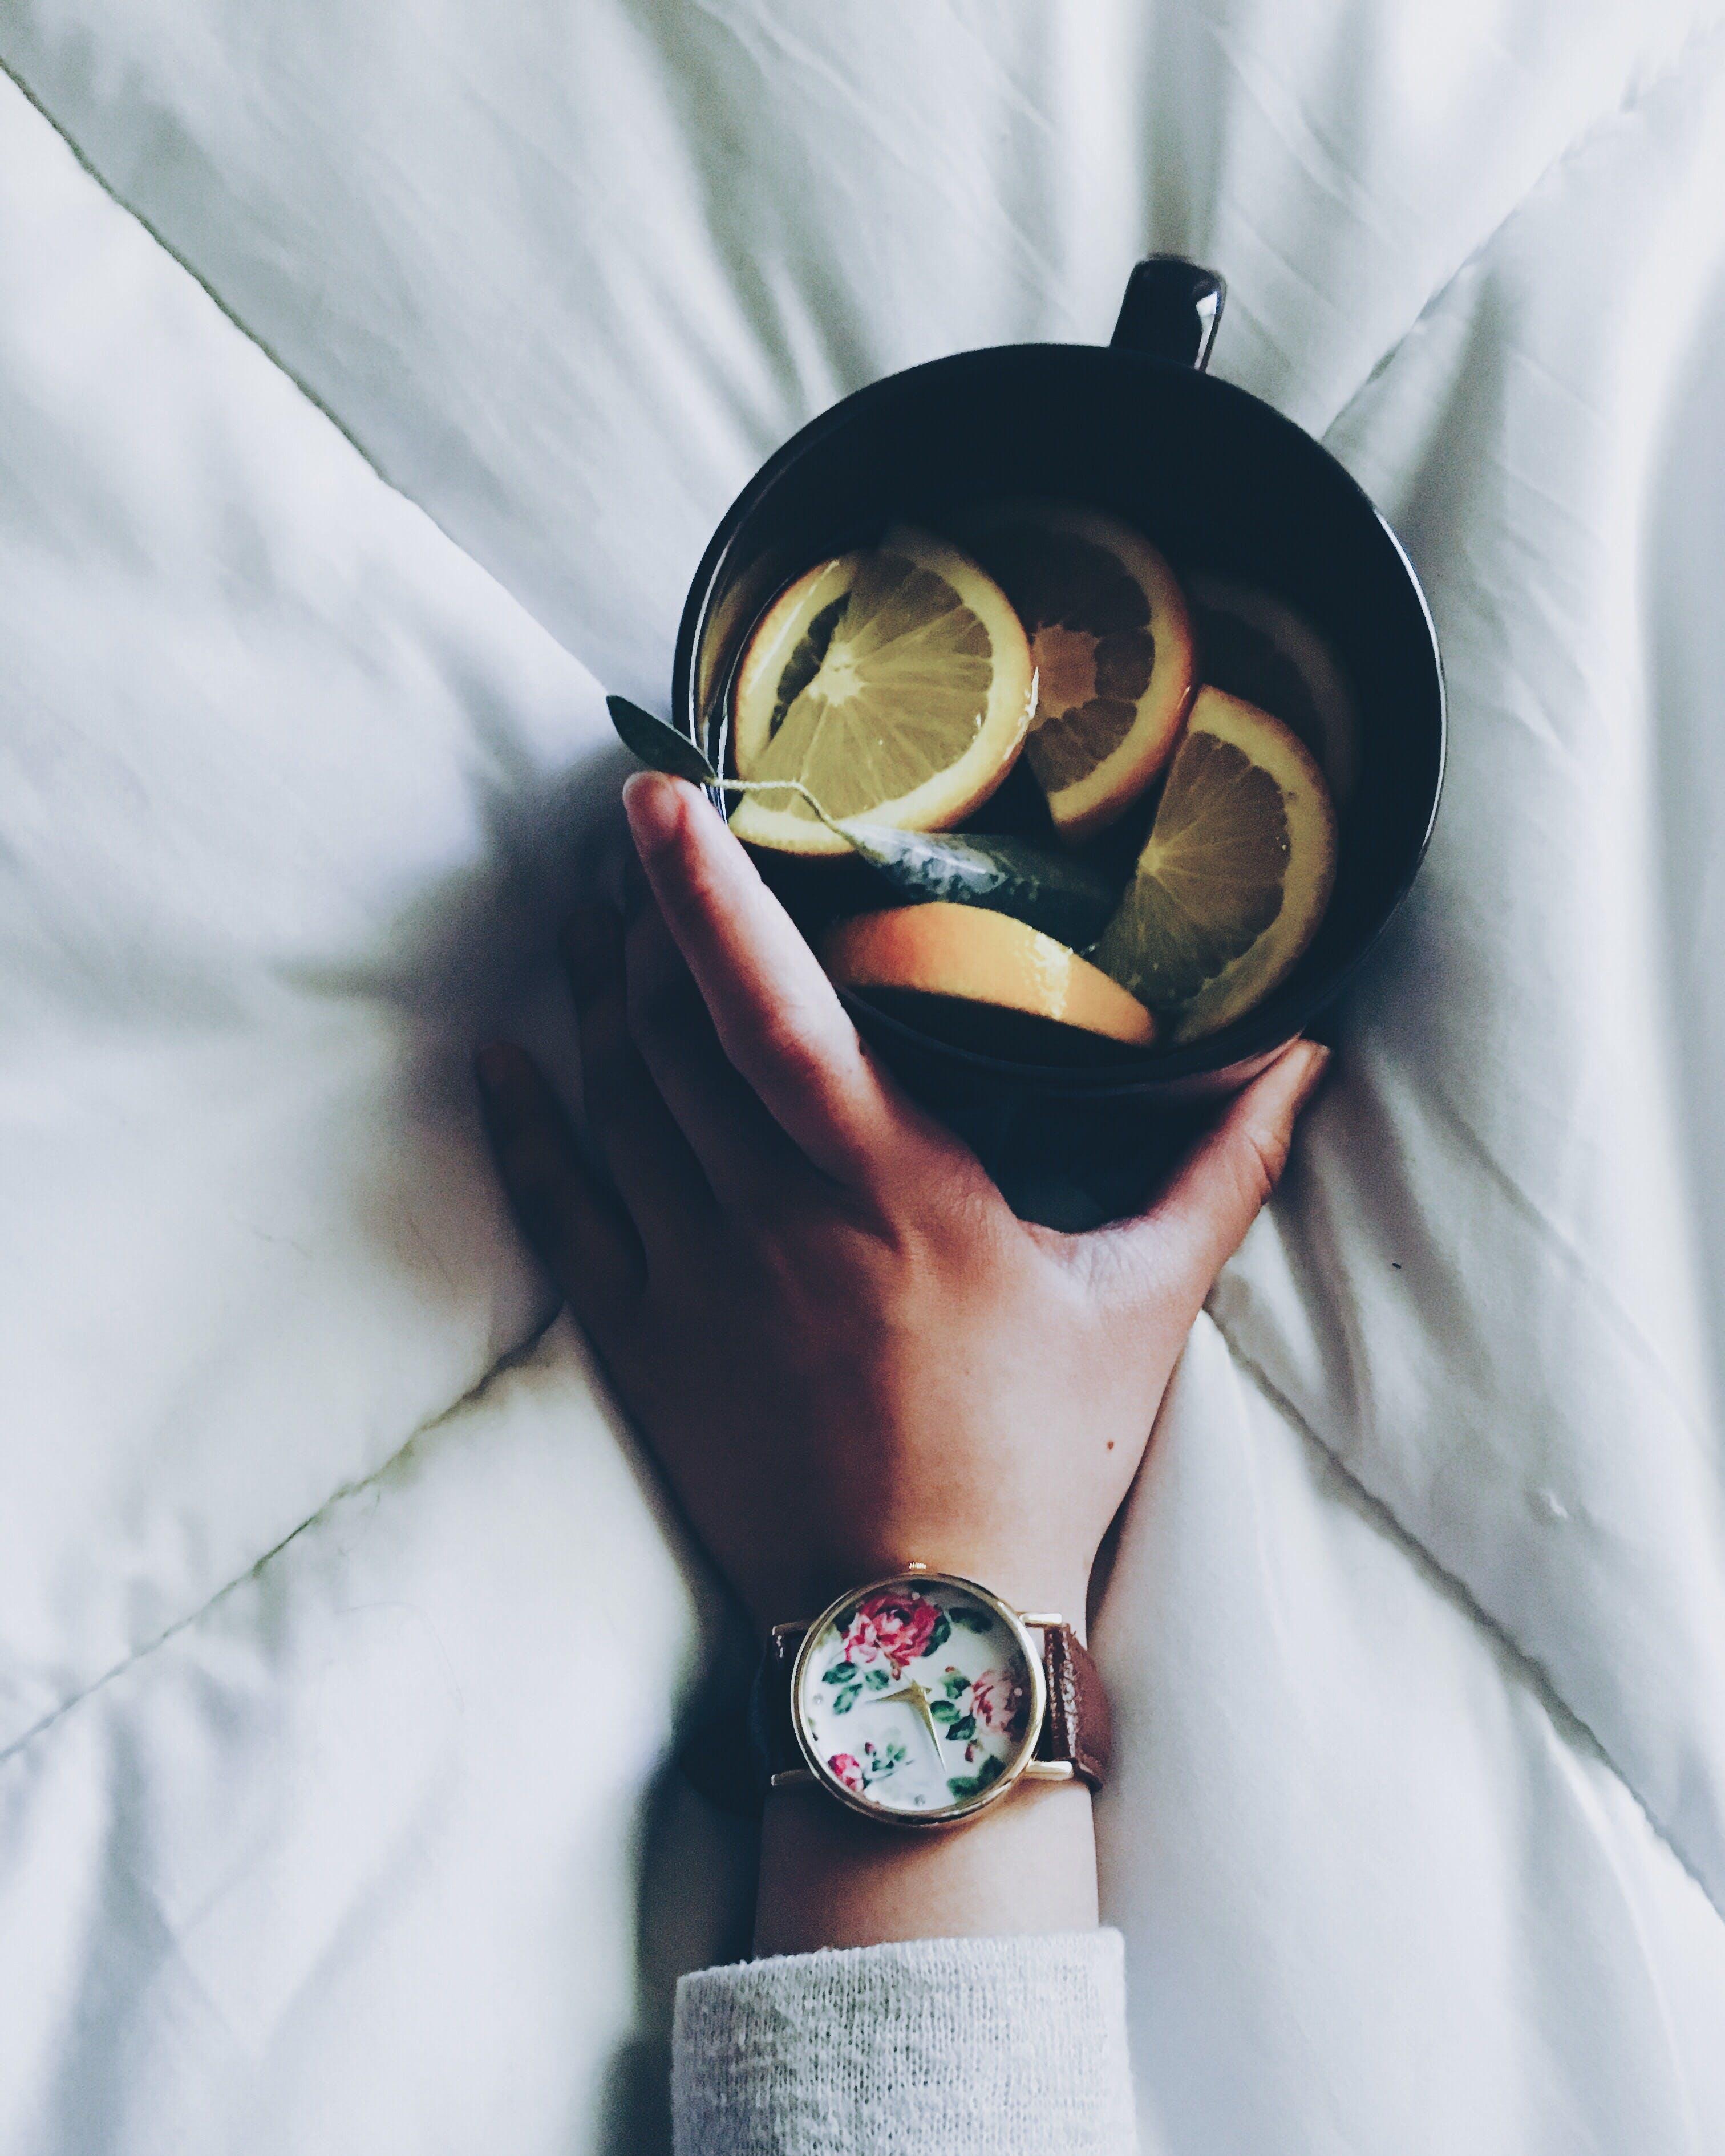 Woman Holding Black Ceramic Mug With Sliced Lemon on Top of White Bed Comforter